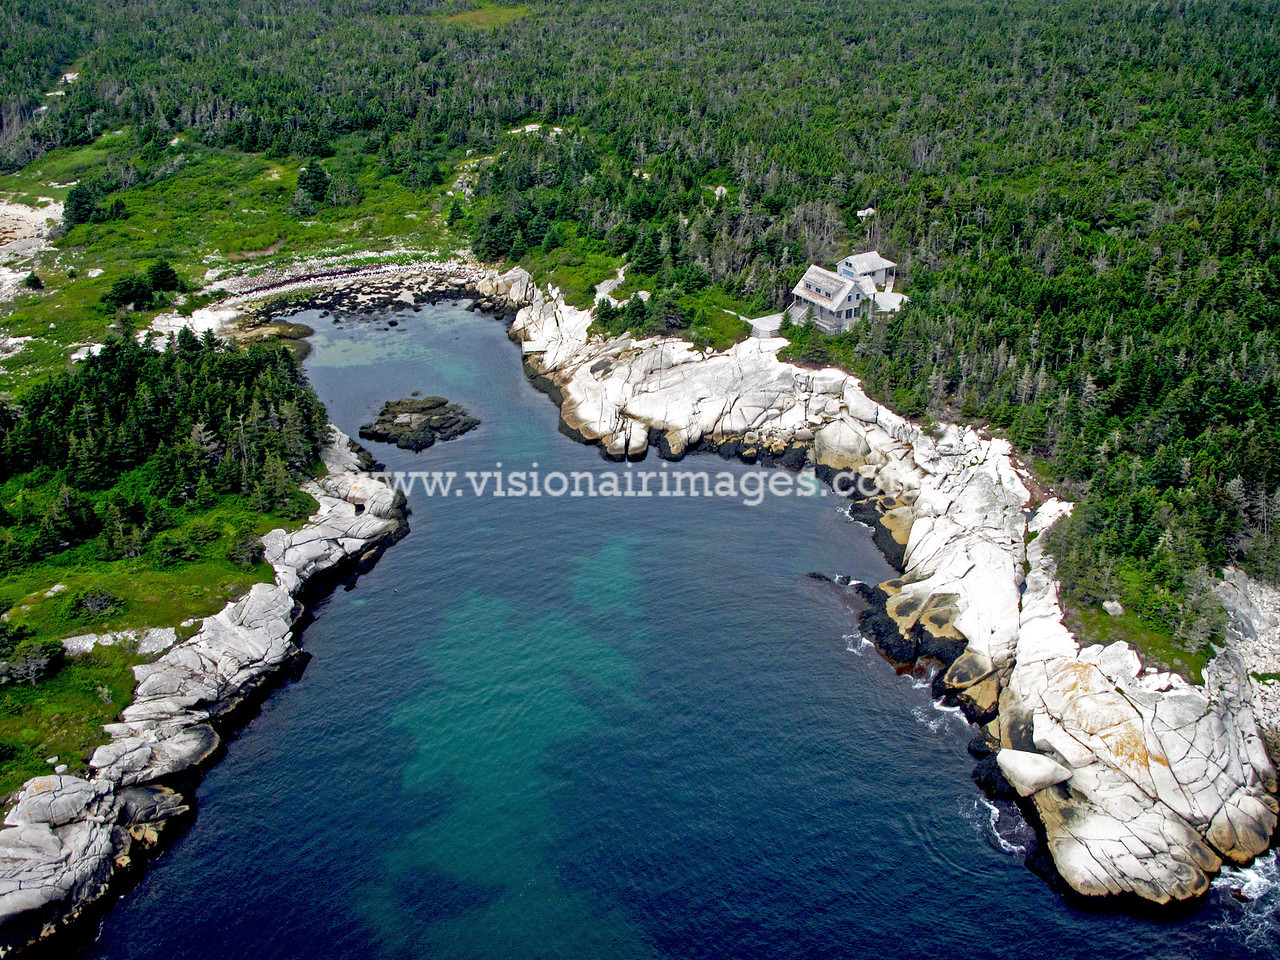 Remote Home, Betty's Island, Propect, Lwr. Prospect, Lighthouse Route, Nova Scotia, Canada